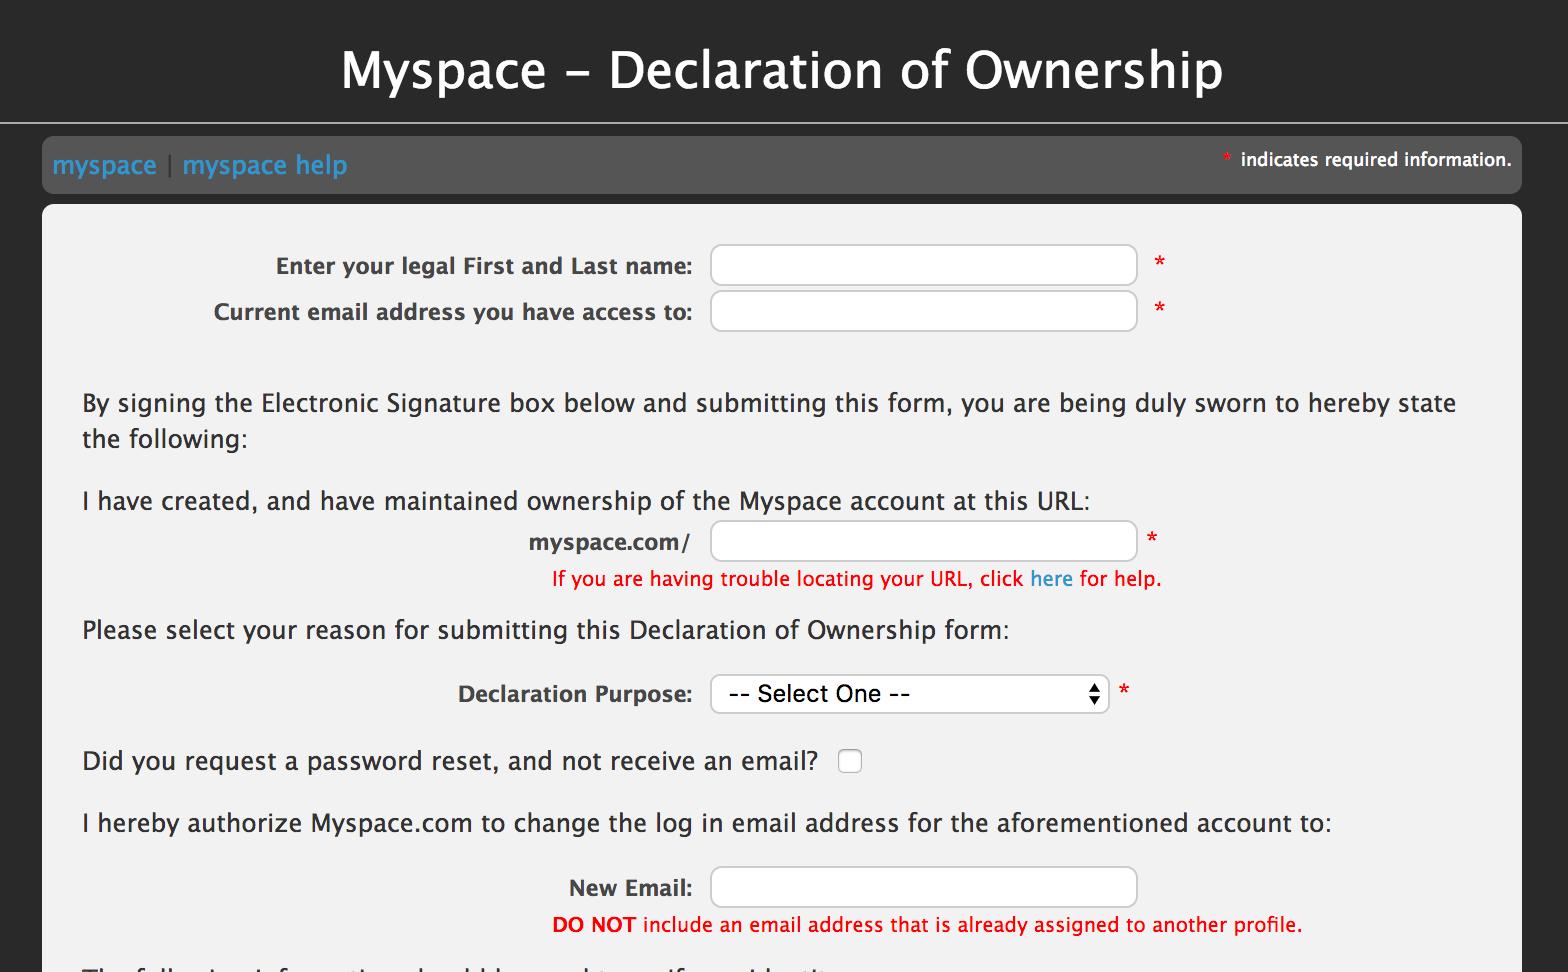 myspace hacked 2018